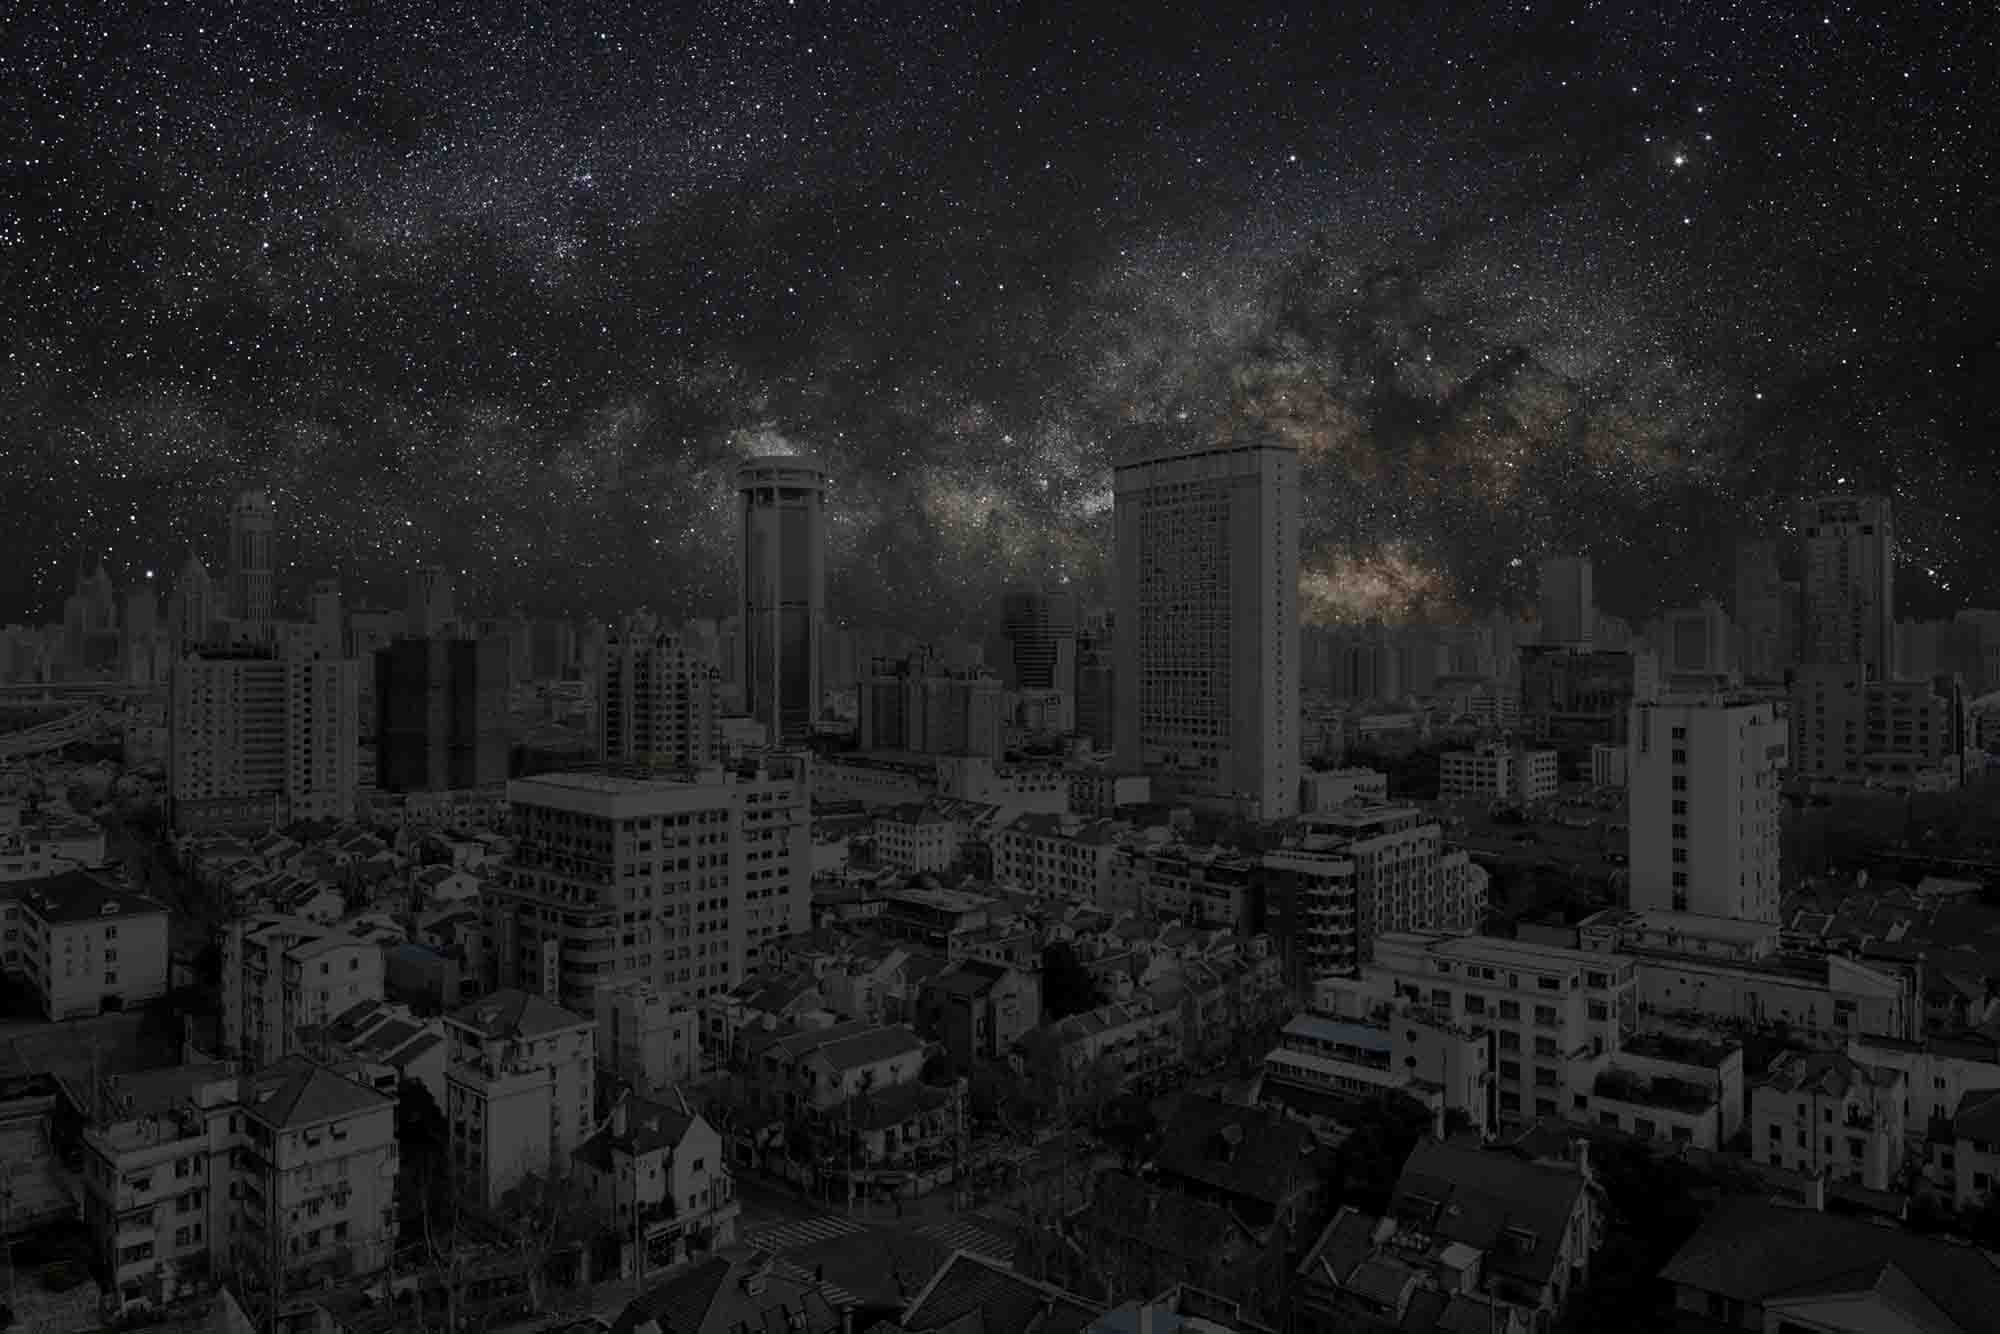 Shanghai 31° 13' 27'' N 2012-03-20 lst 13:57<br/>Darkened Cities - Villes éteintes